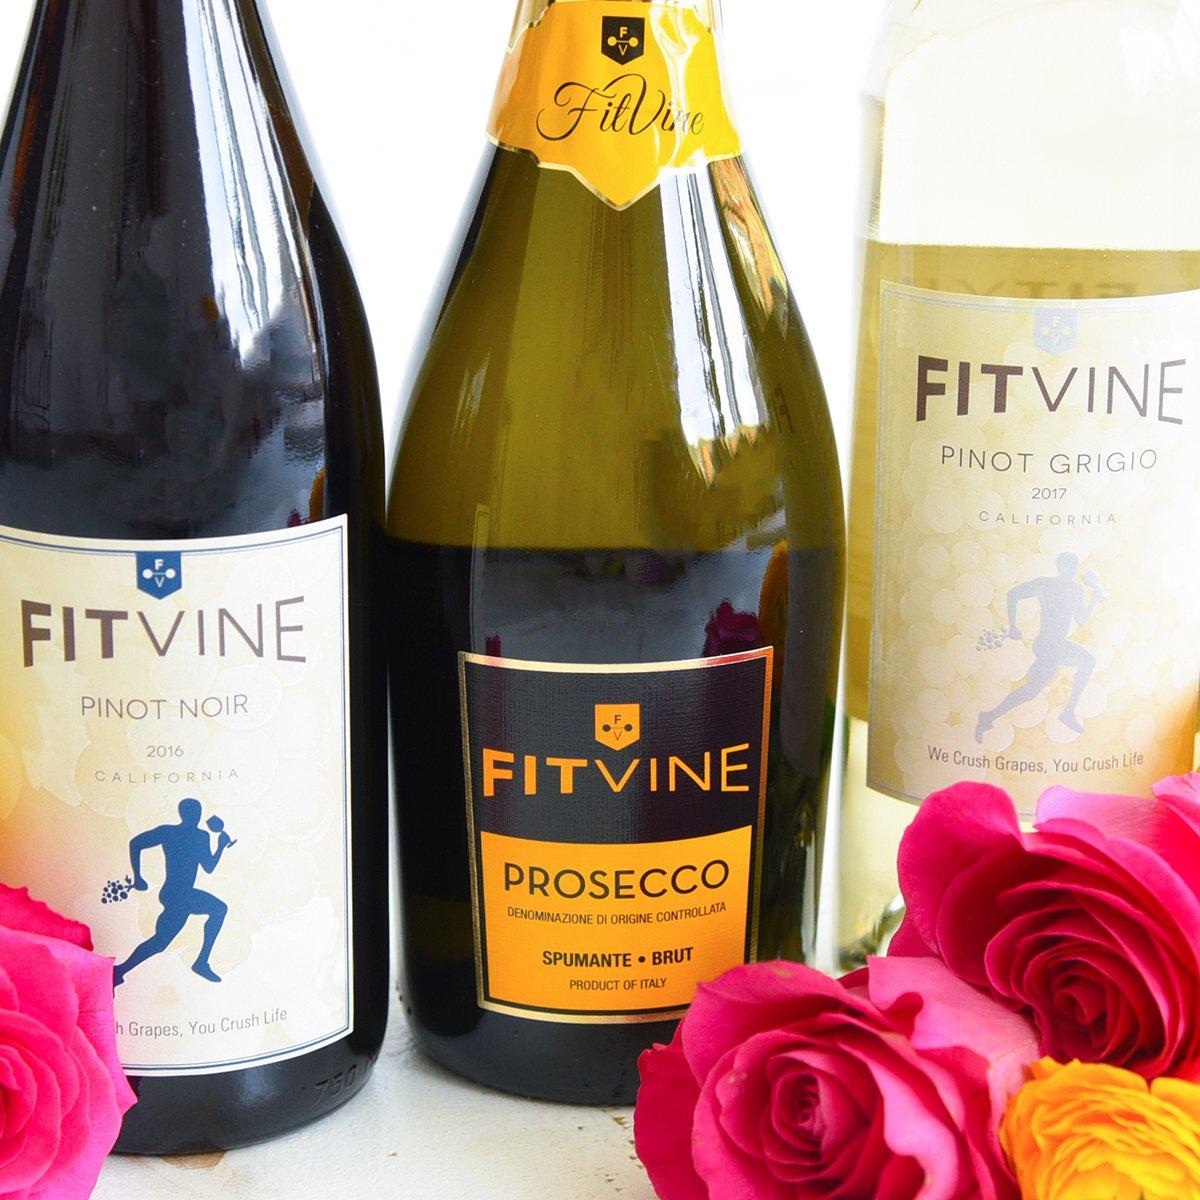 Fitvine Wine Fitvinewine Twitter